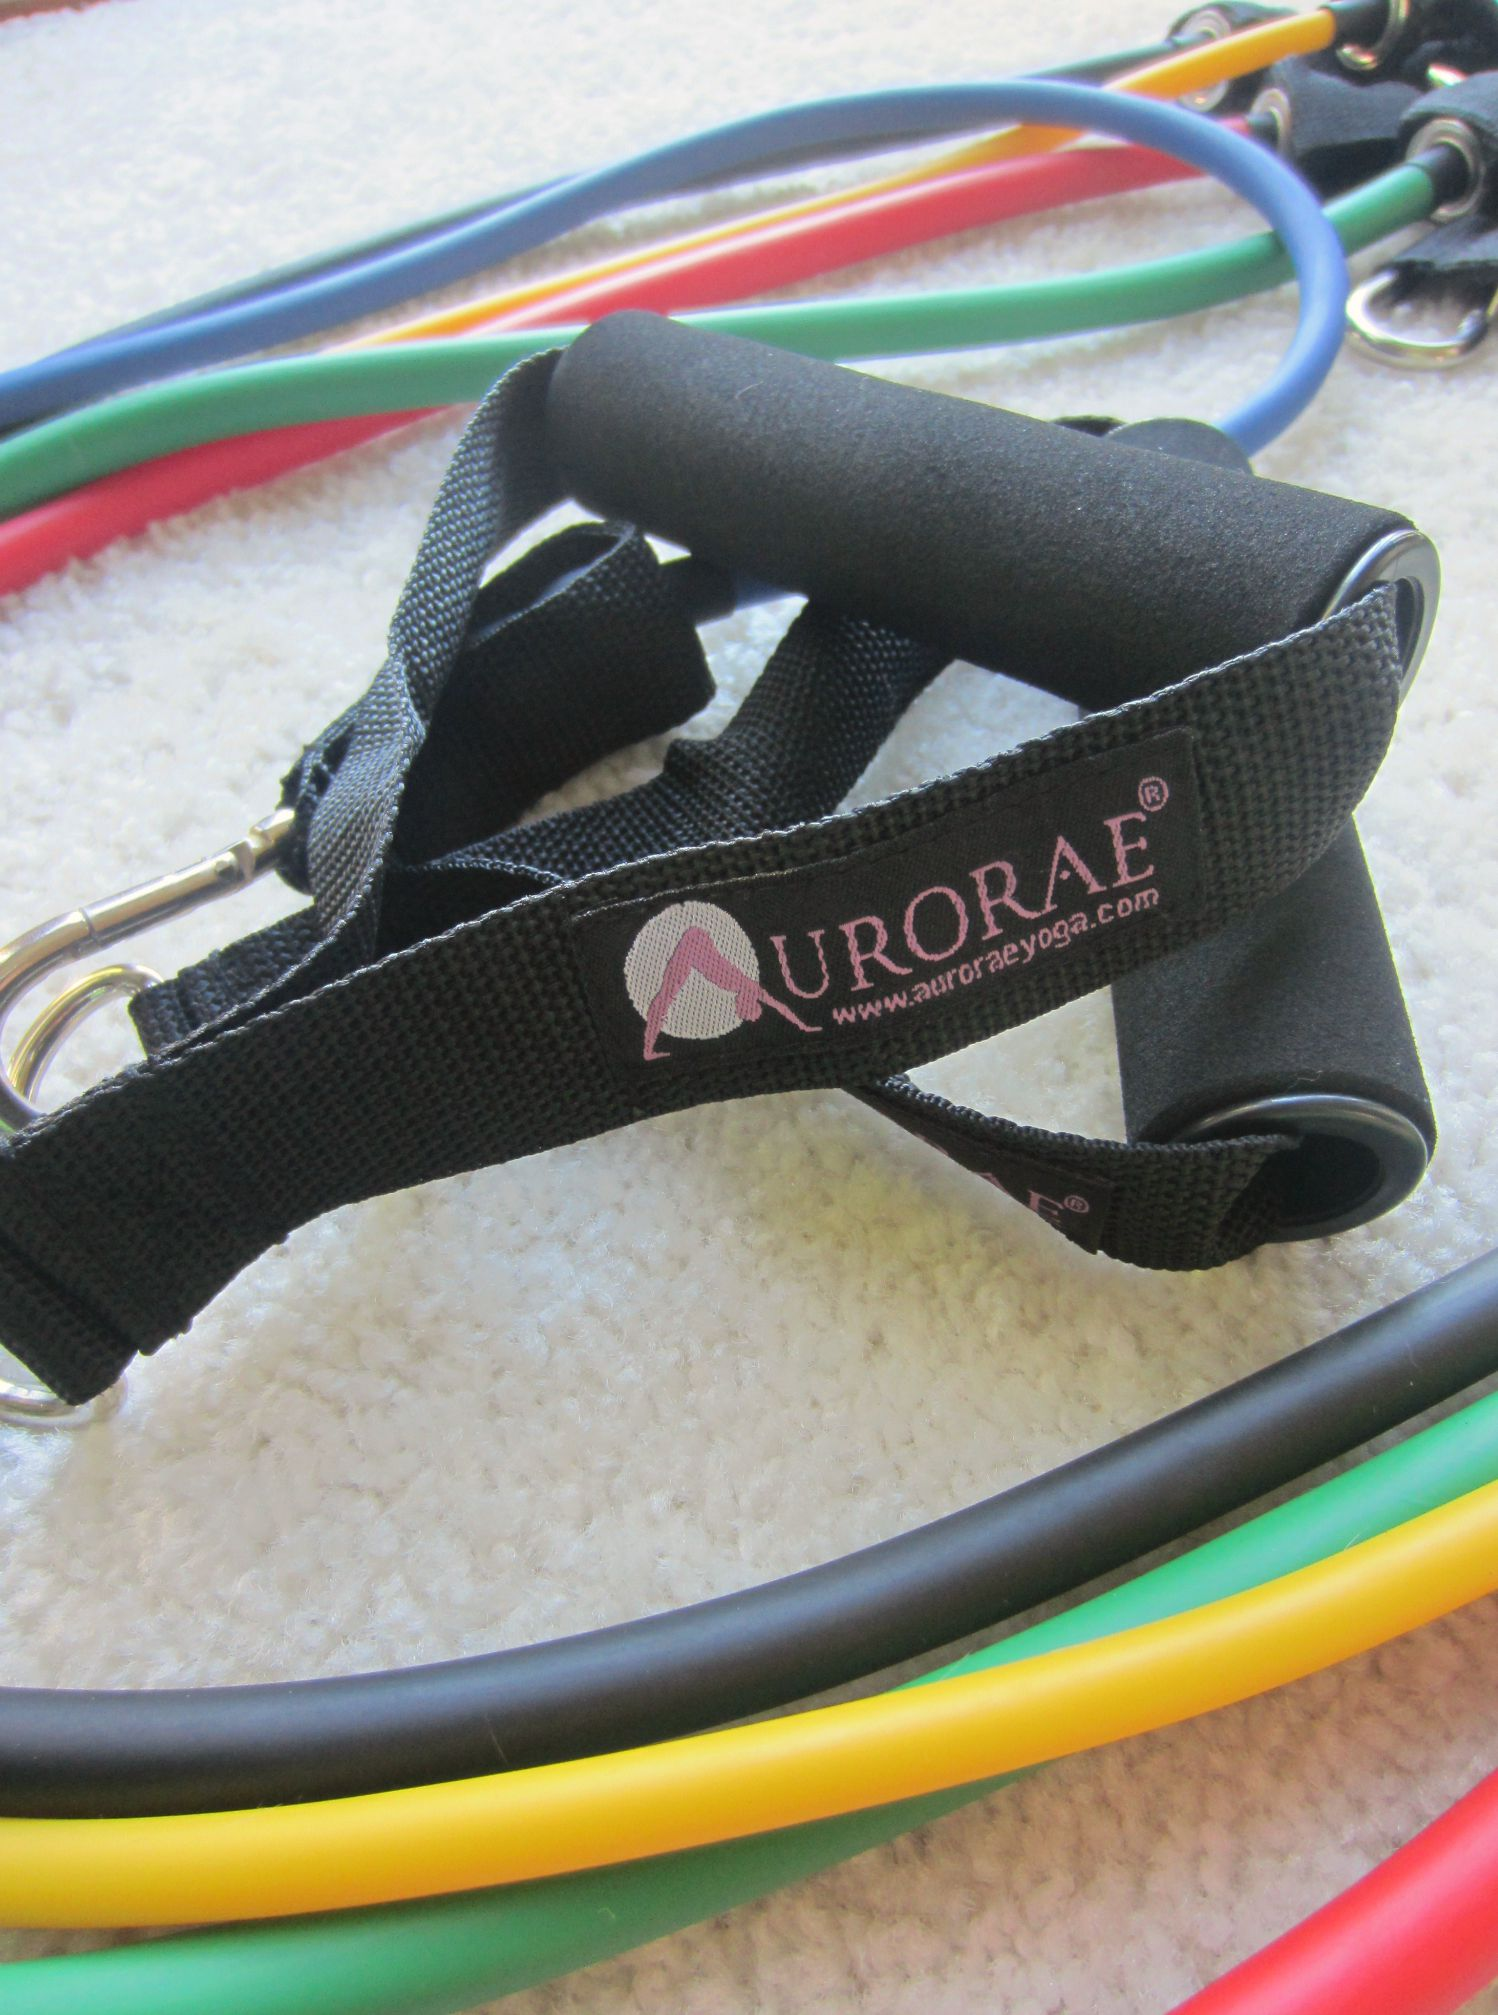 aurorae yoga resistance bands